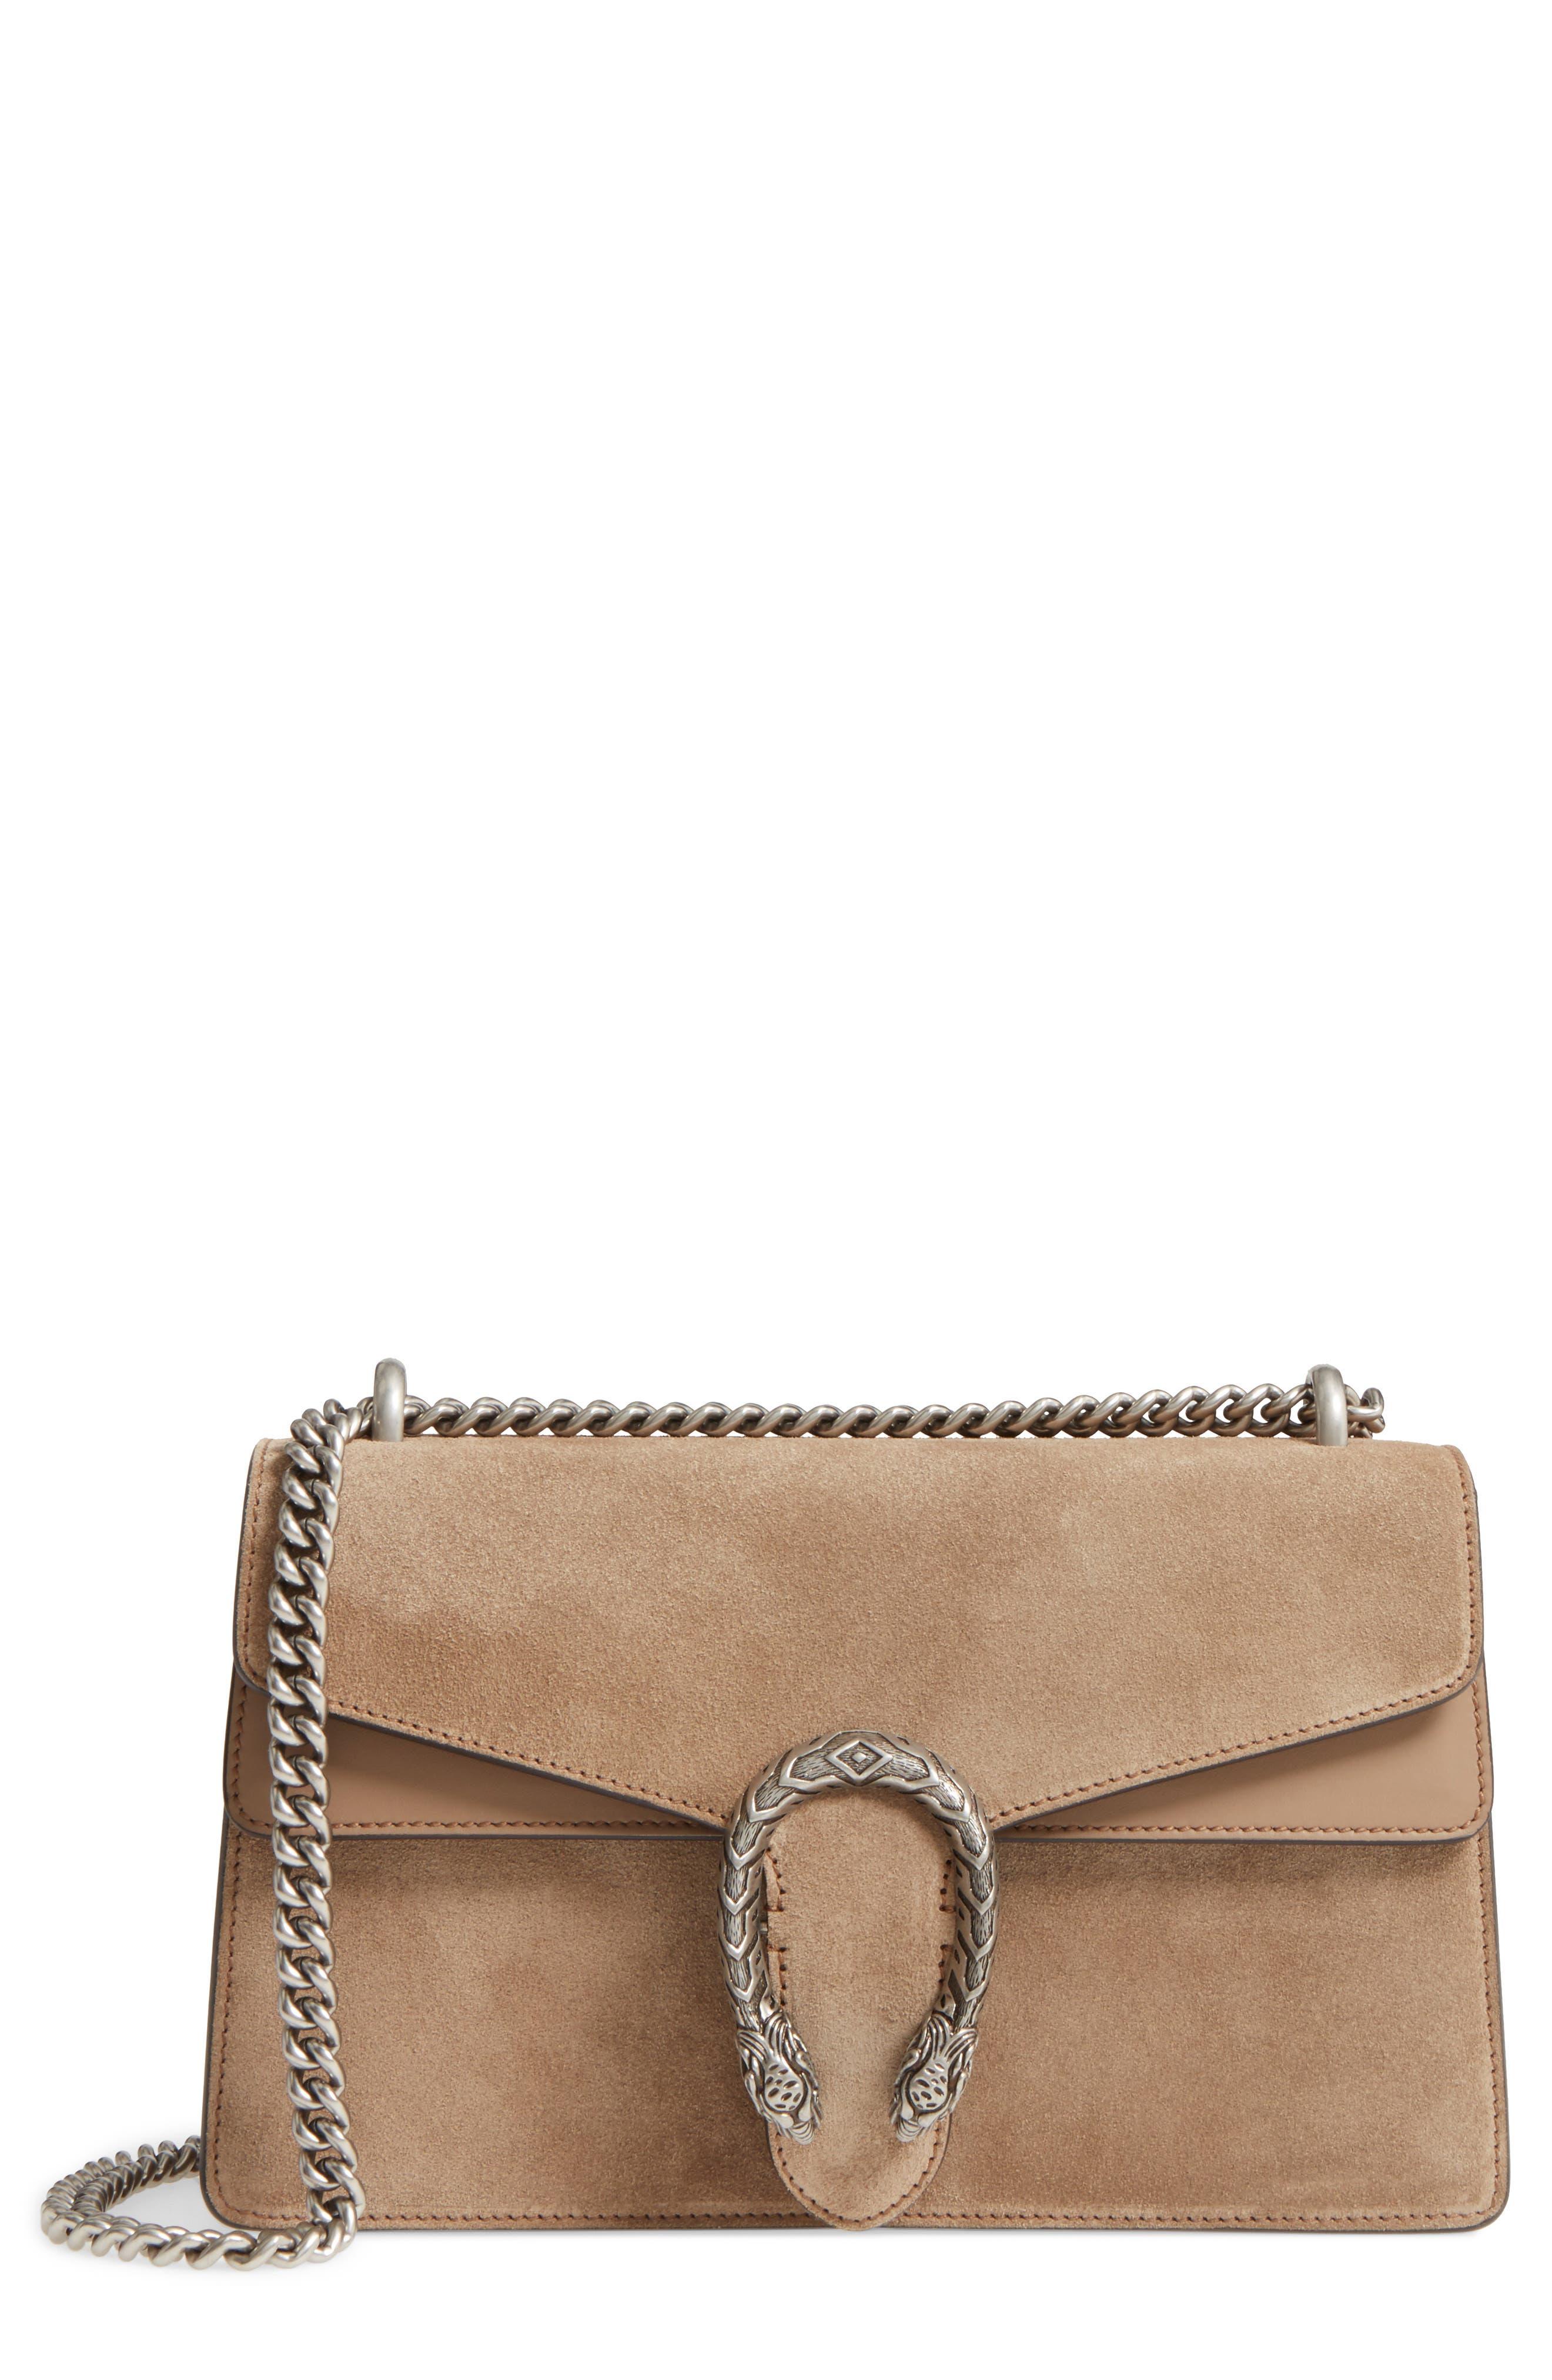 Alternate Image 1 Selected - Gucci Small Dionysus Suede Shoulder Bag